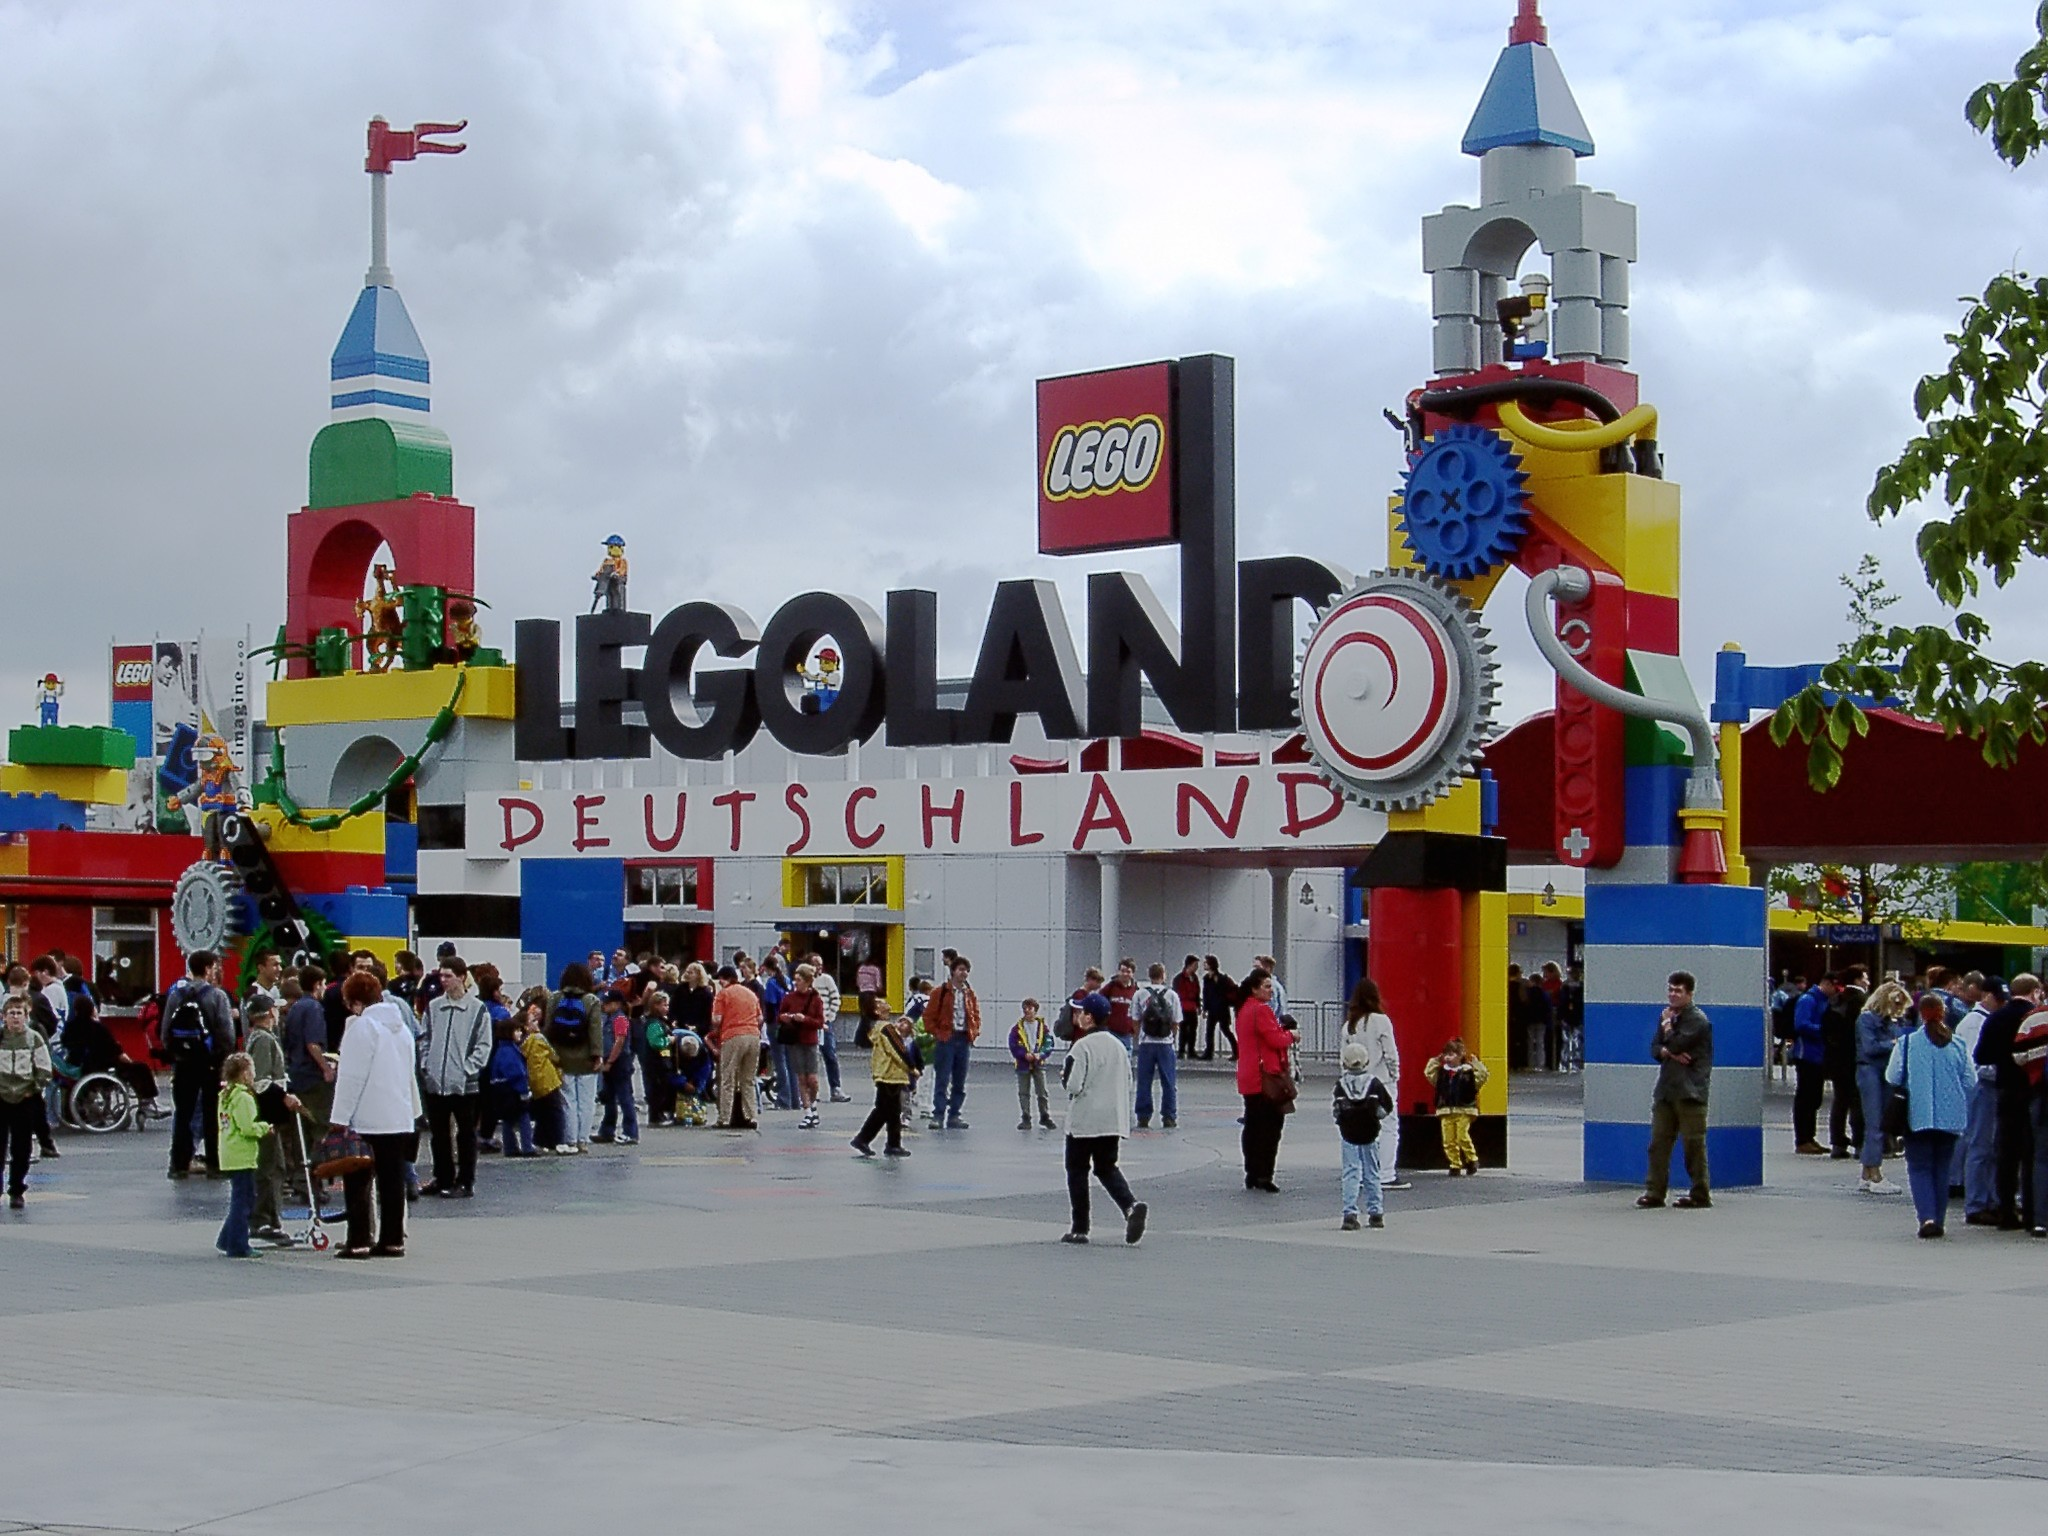 The entrance to Legoland Deutschland